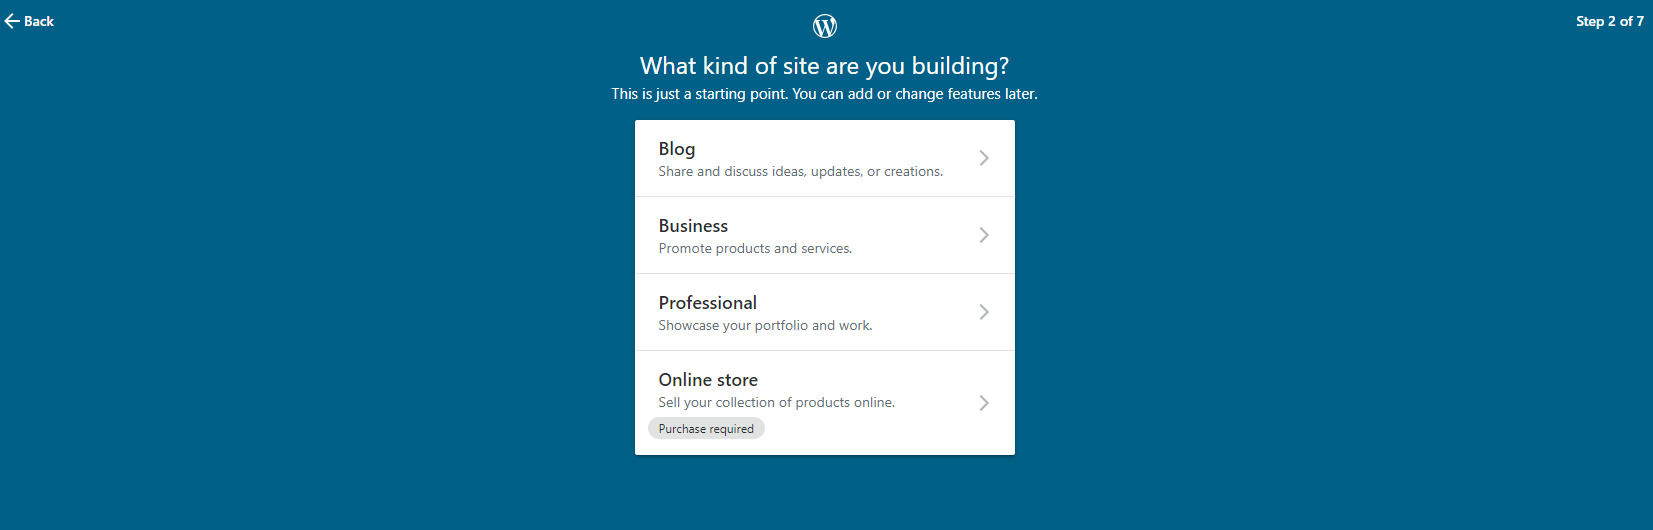 WordPress.com Account Setup 2019